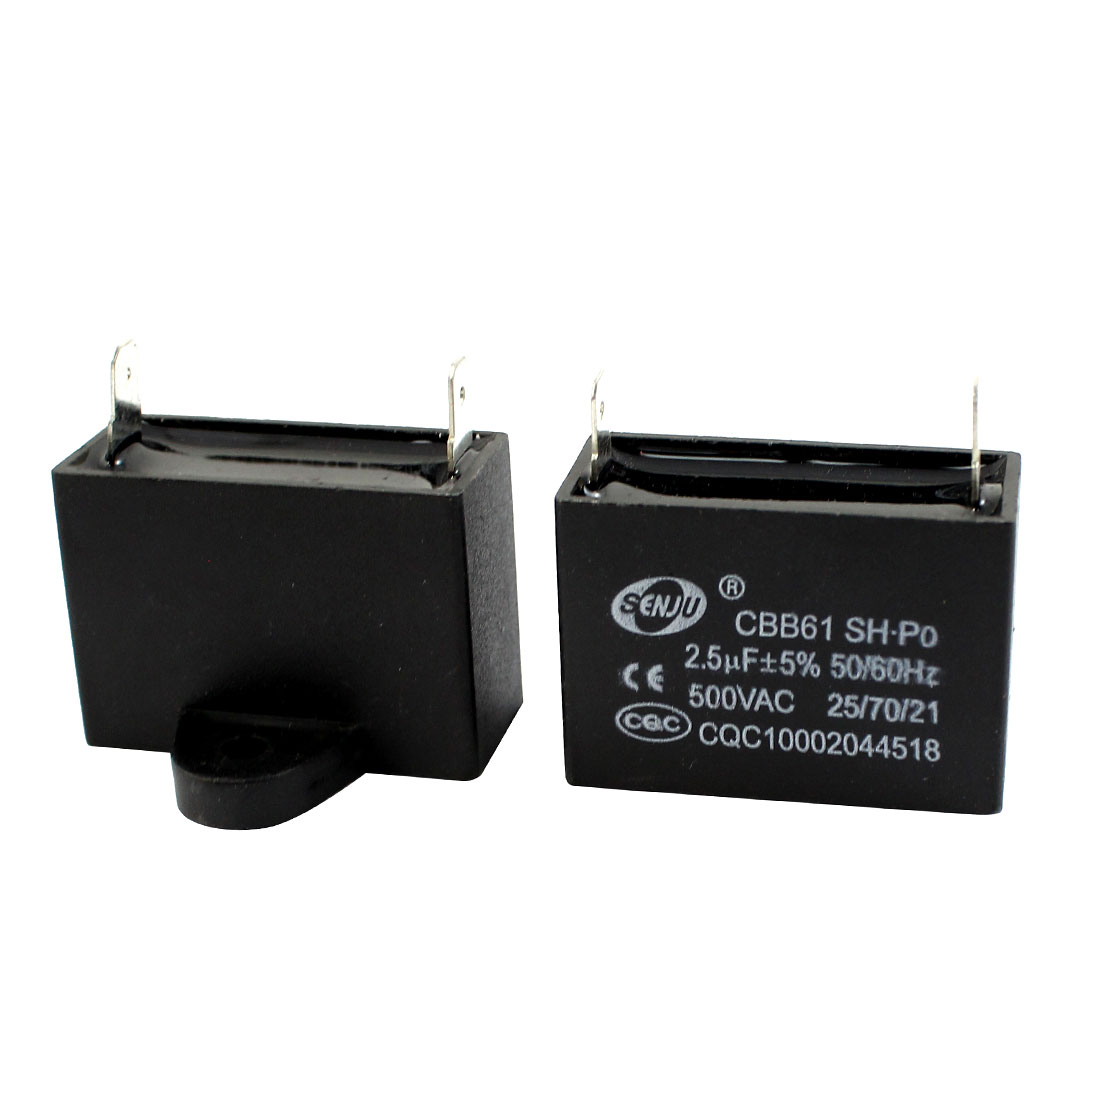 CBB61 AC 500V 2.5uF 2 Terminal Water Heater Motor Run Capacitor 2pcs